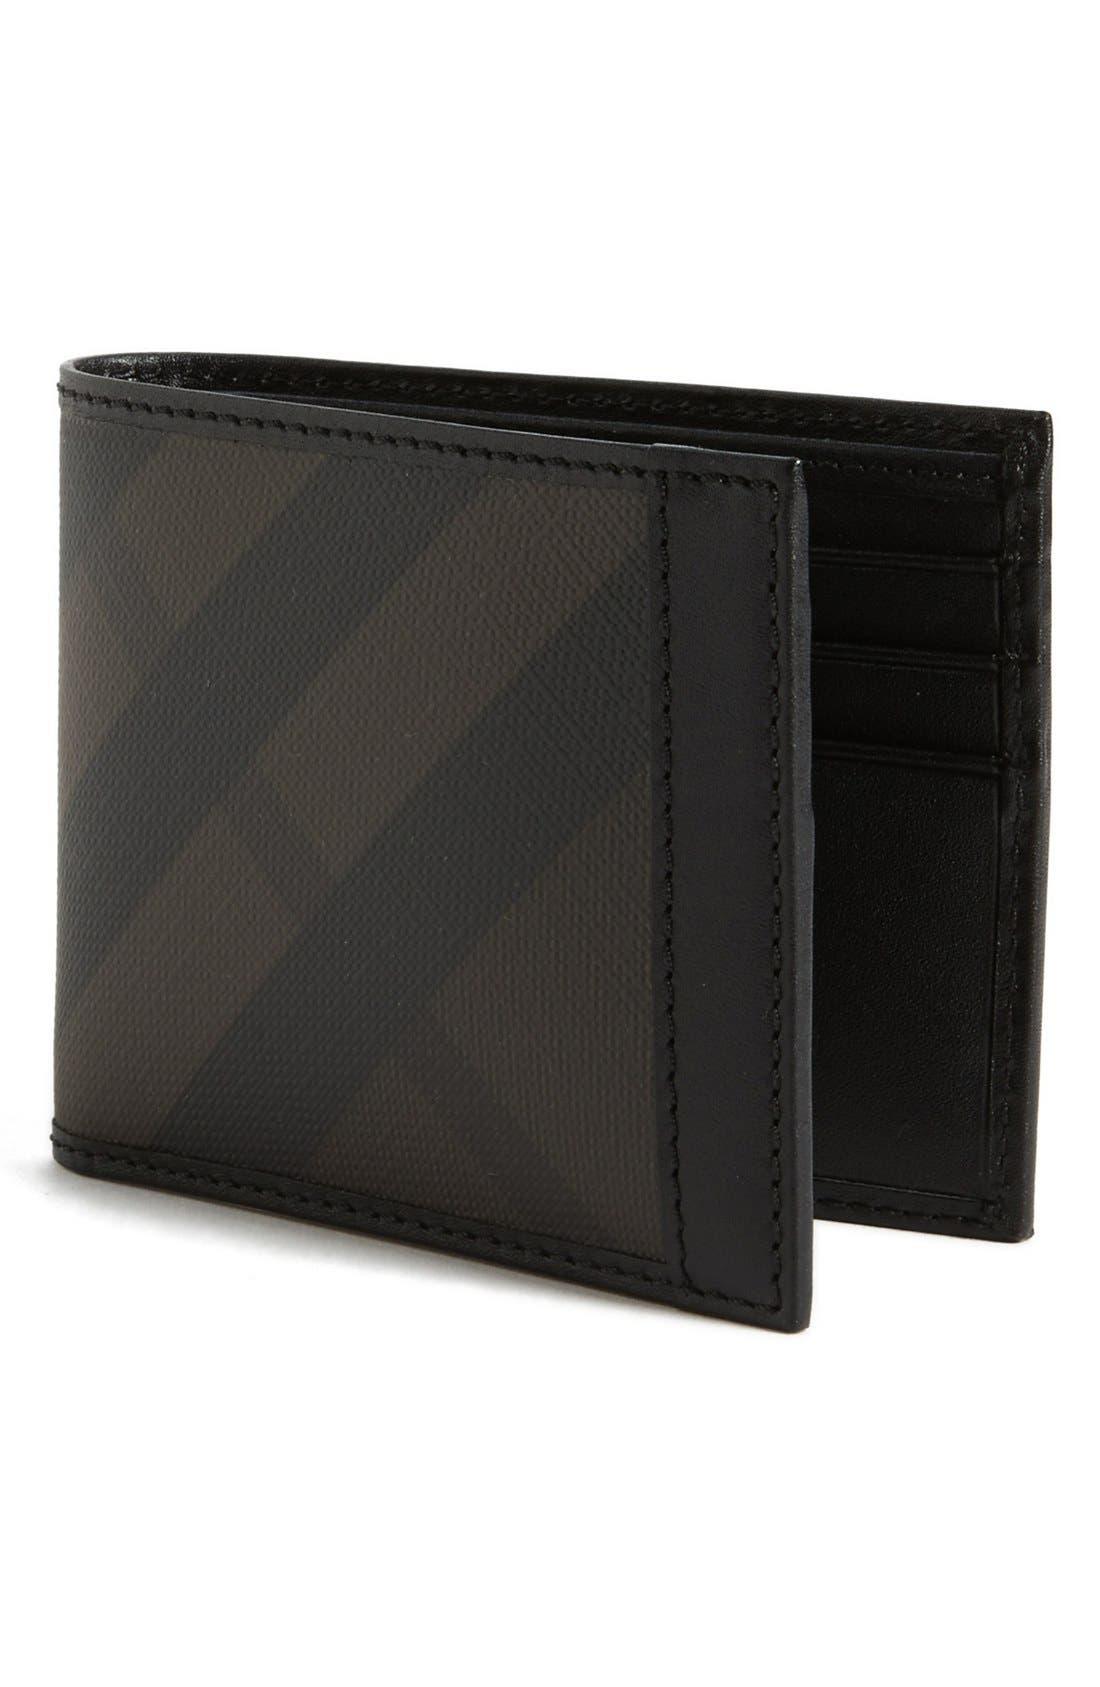 Check Print Wallet,                         Main,                         color, Chocolate